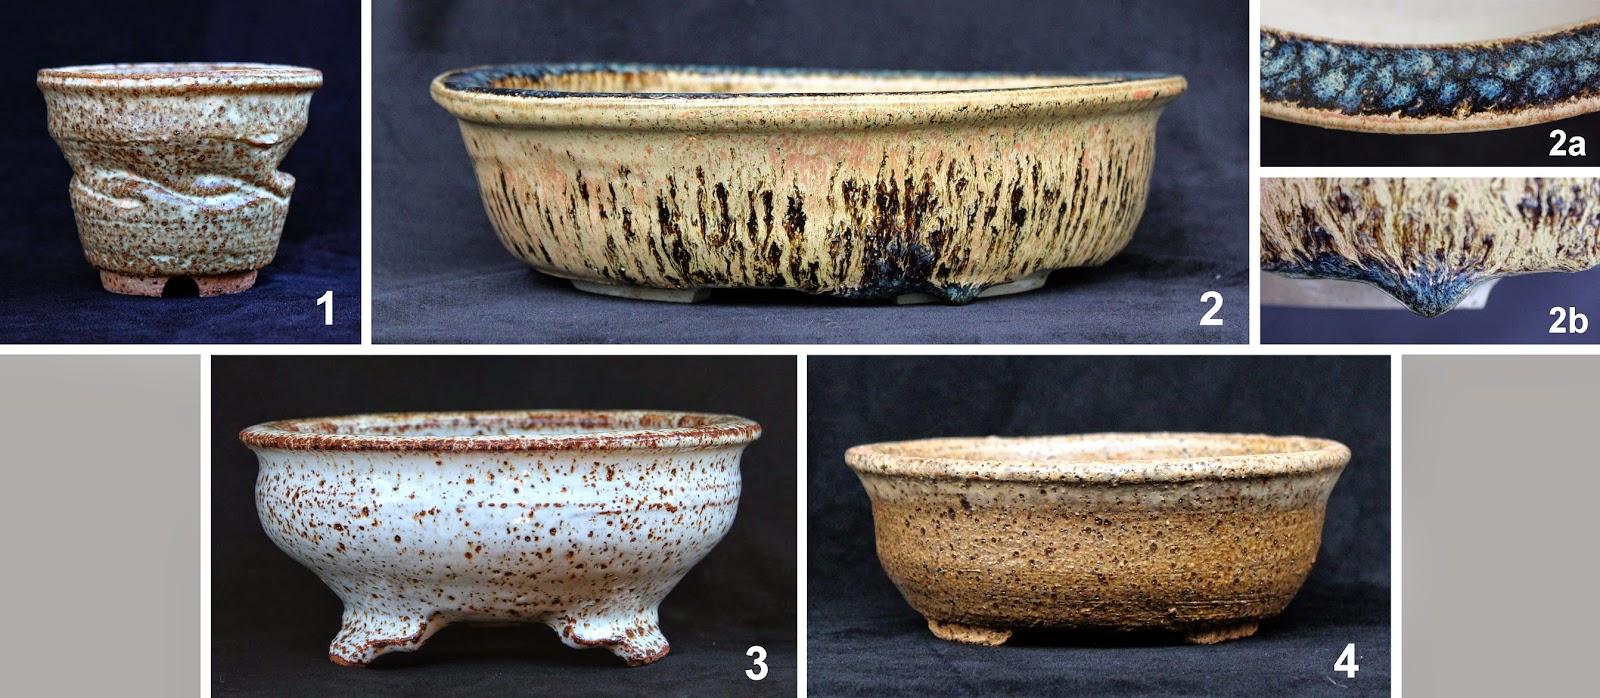 Kigawa39s Bonsai Blog This Year39s Bonsai Pots